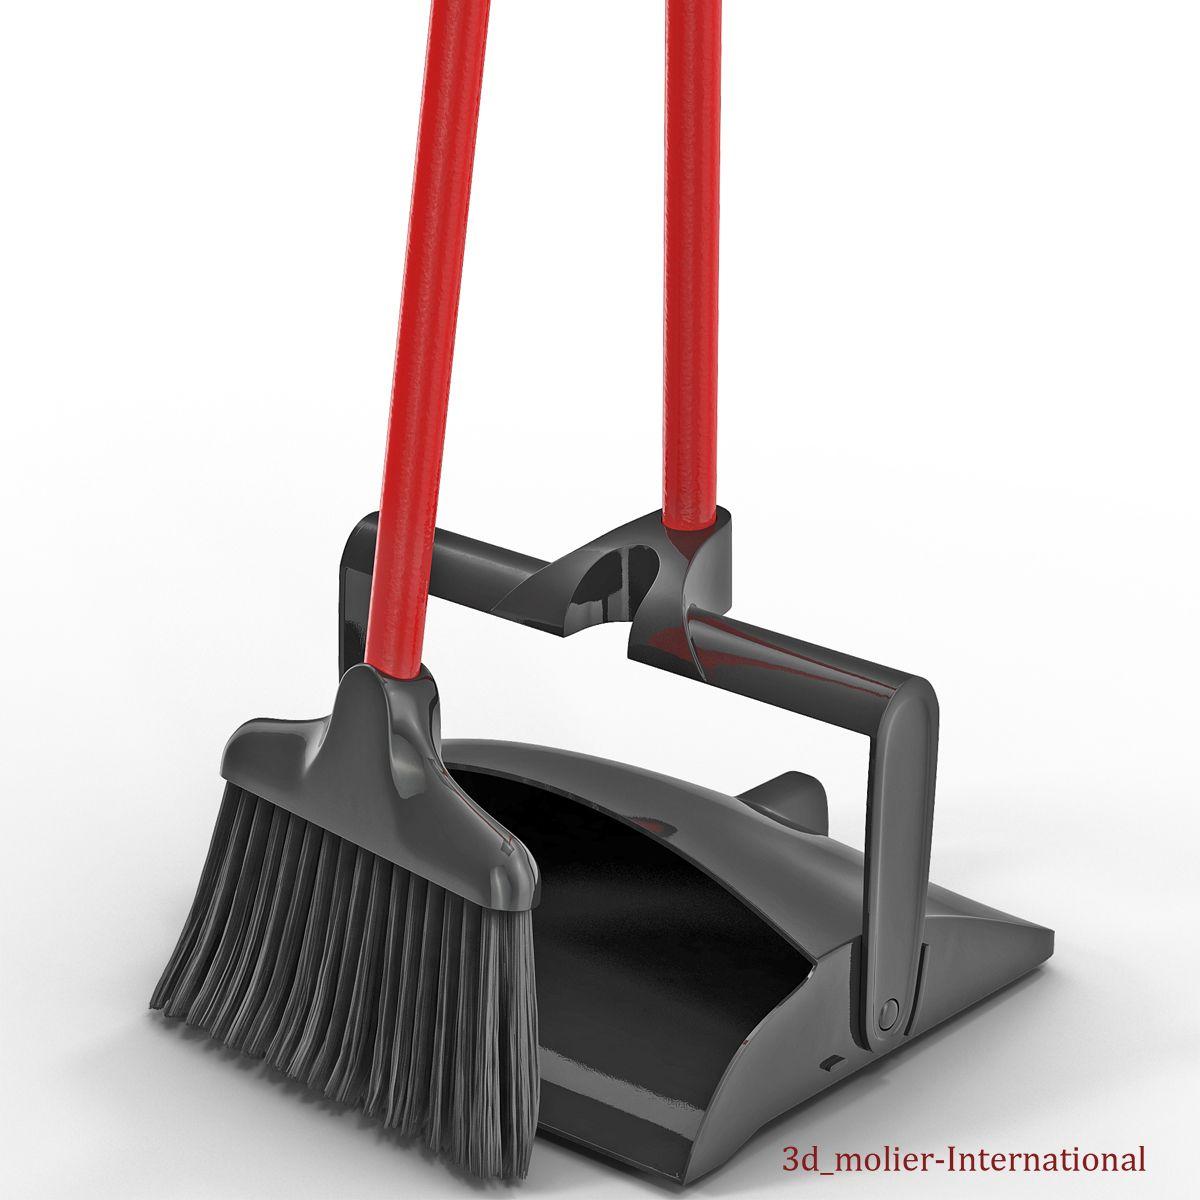 Libman Broom and Dustpan Set 3d model http://www.turbosquid.com/3d-models/libman-broom-dustpan-set-3d-model/900475?referral=3d_molier-International